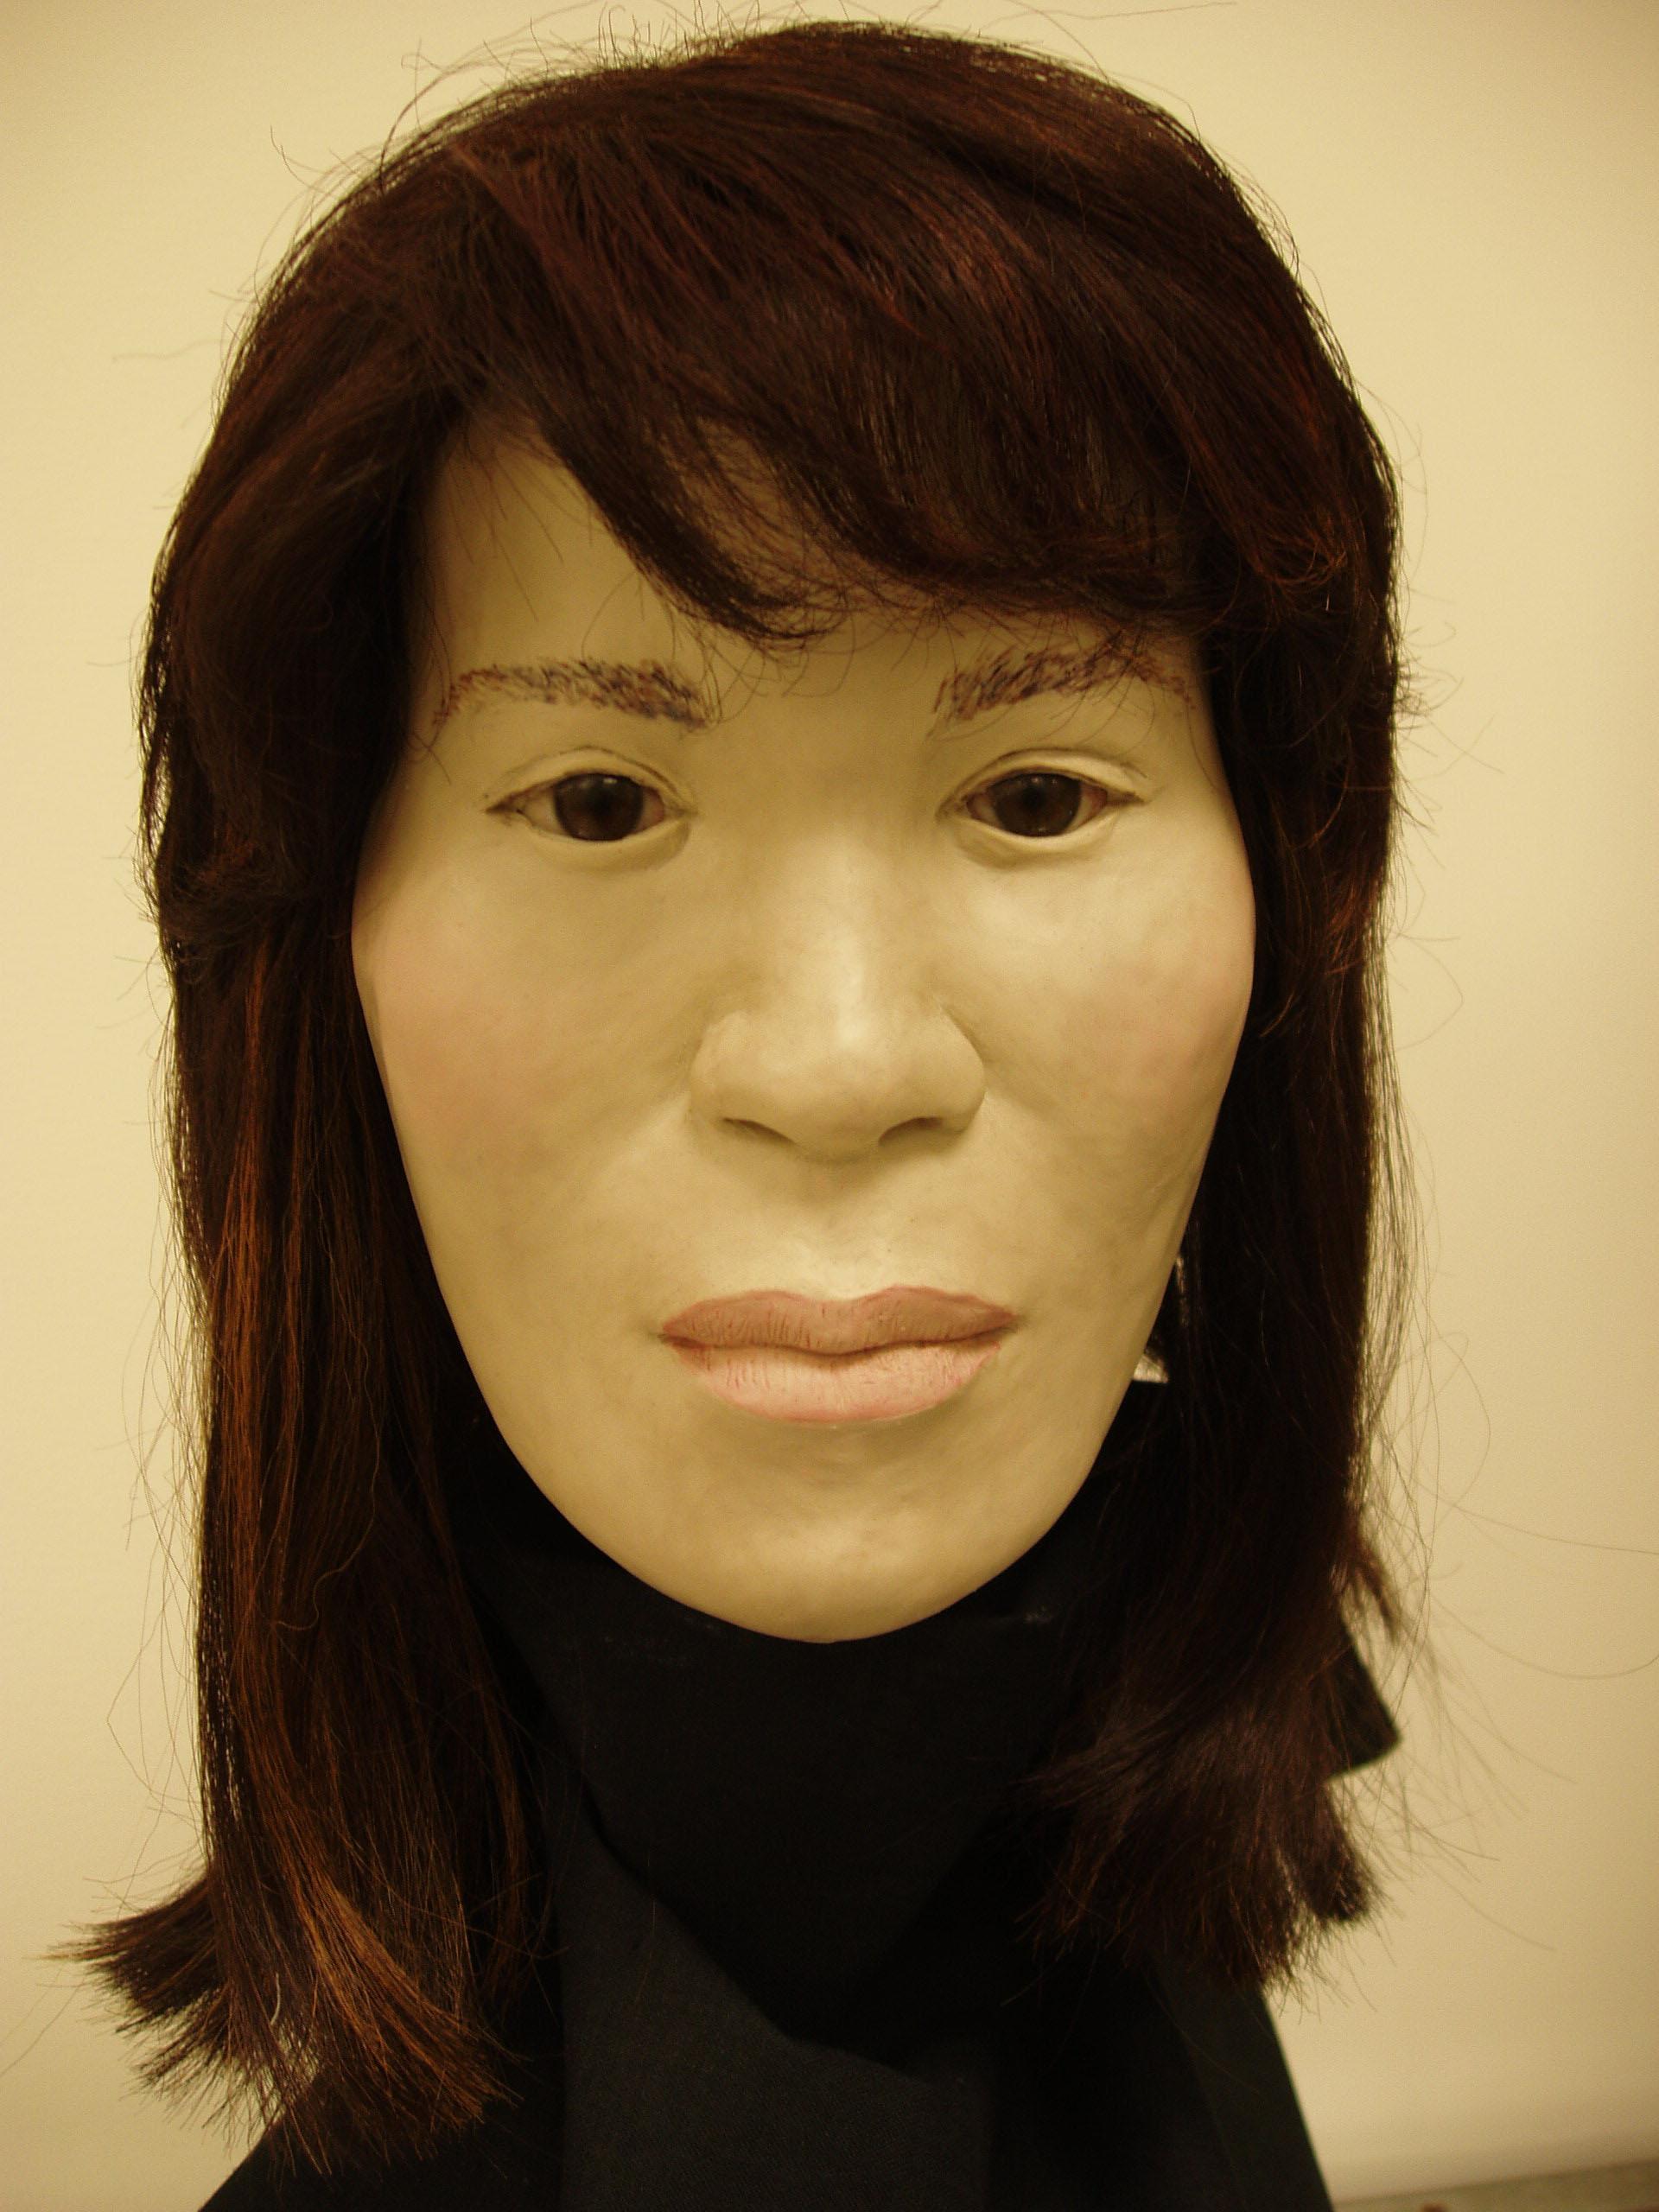 Gloucester County Jane Doe (2004)